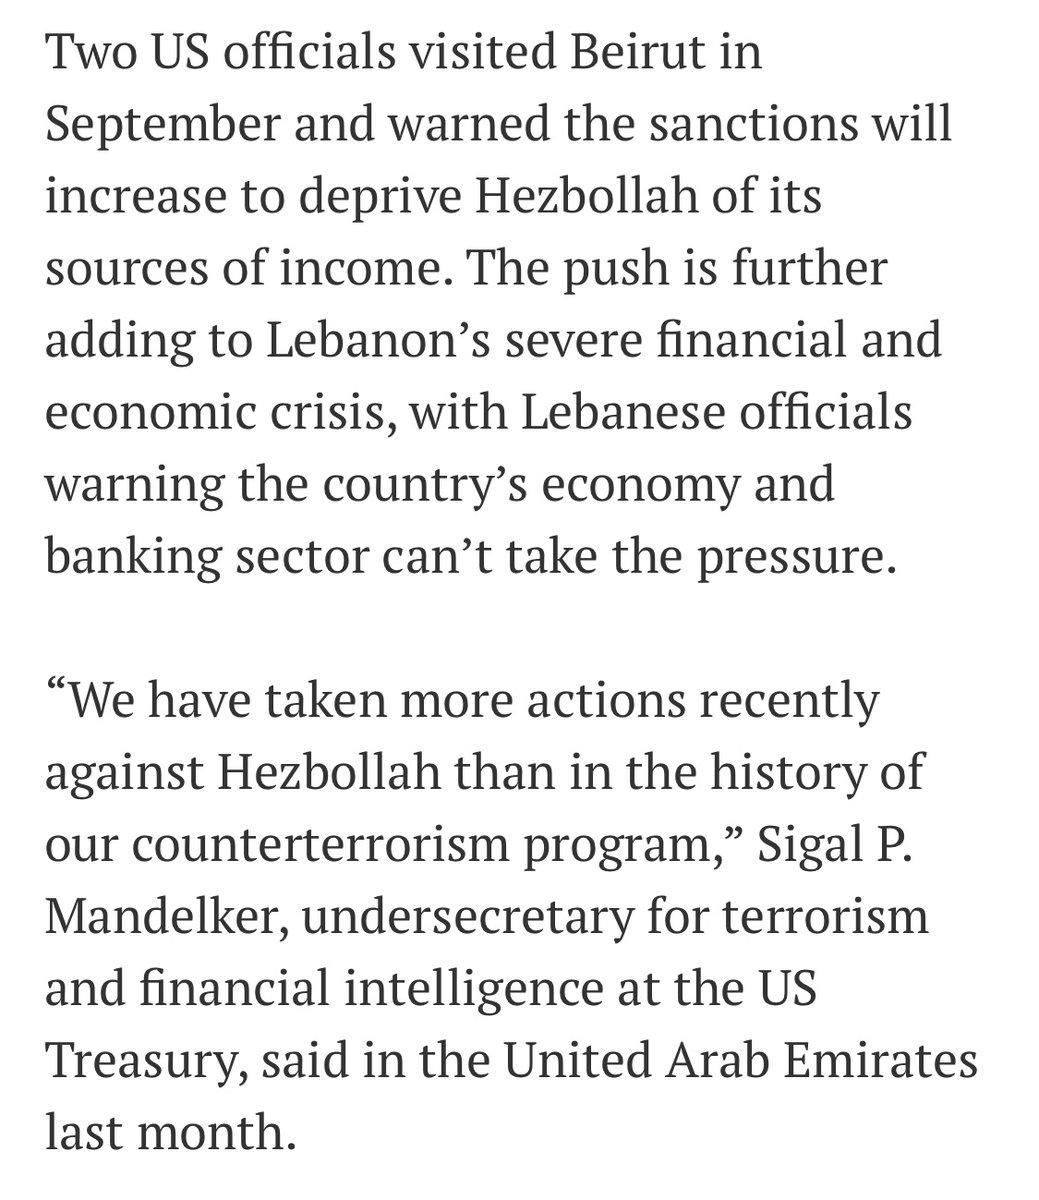 @paulchoufani @romyjournalist I don't think so. timesofisrael.com/us-sanctions-o…